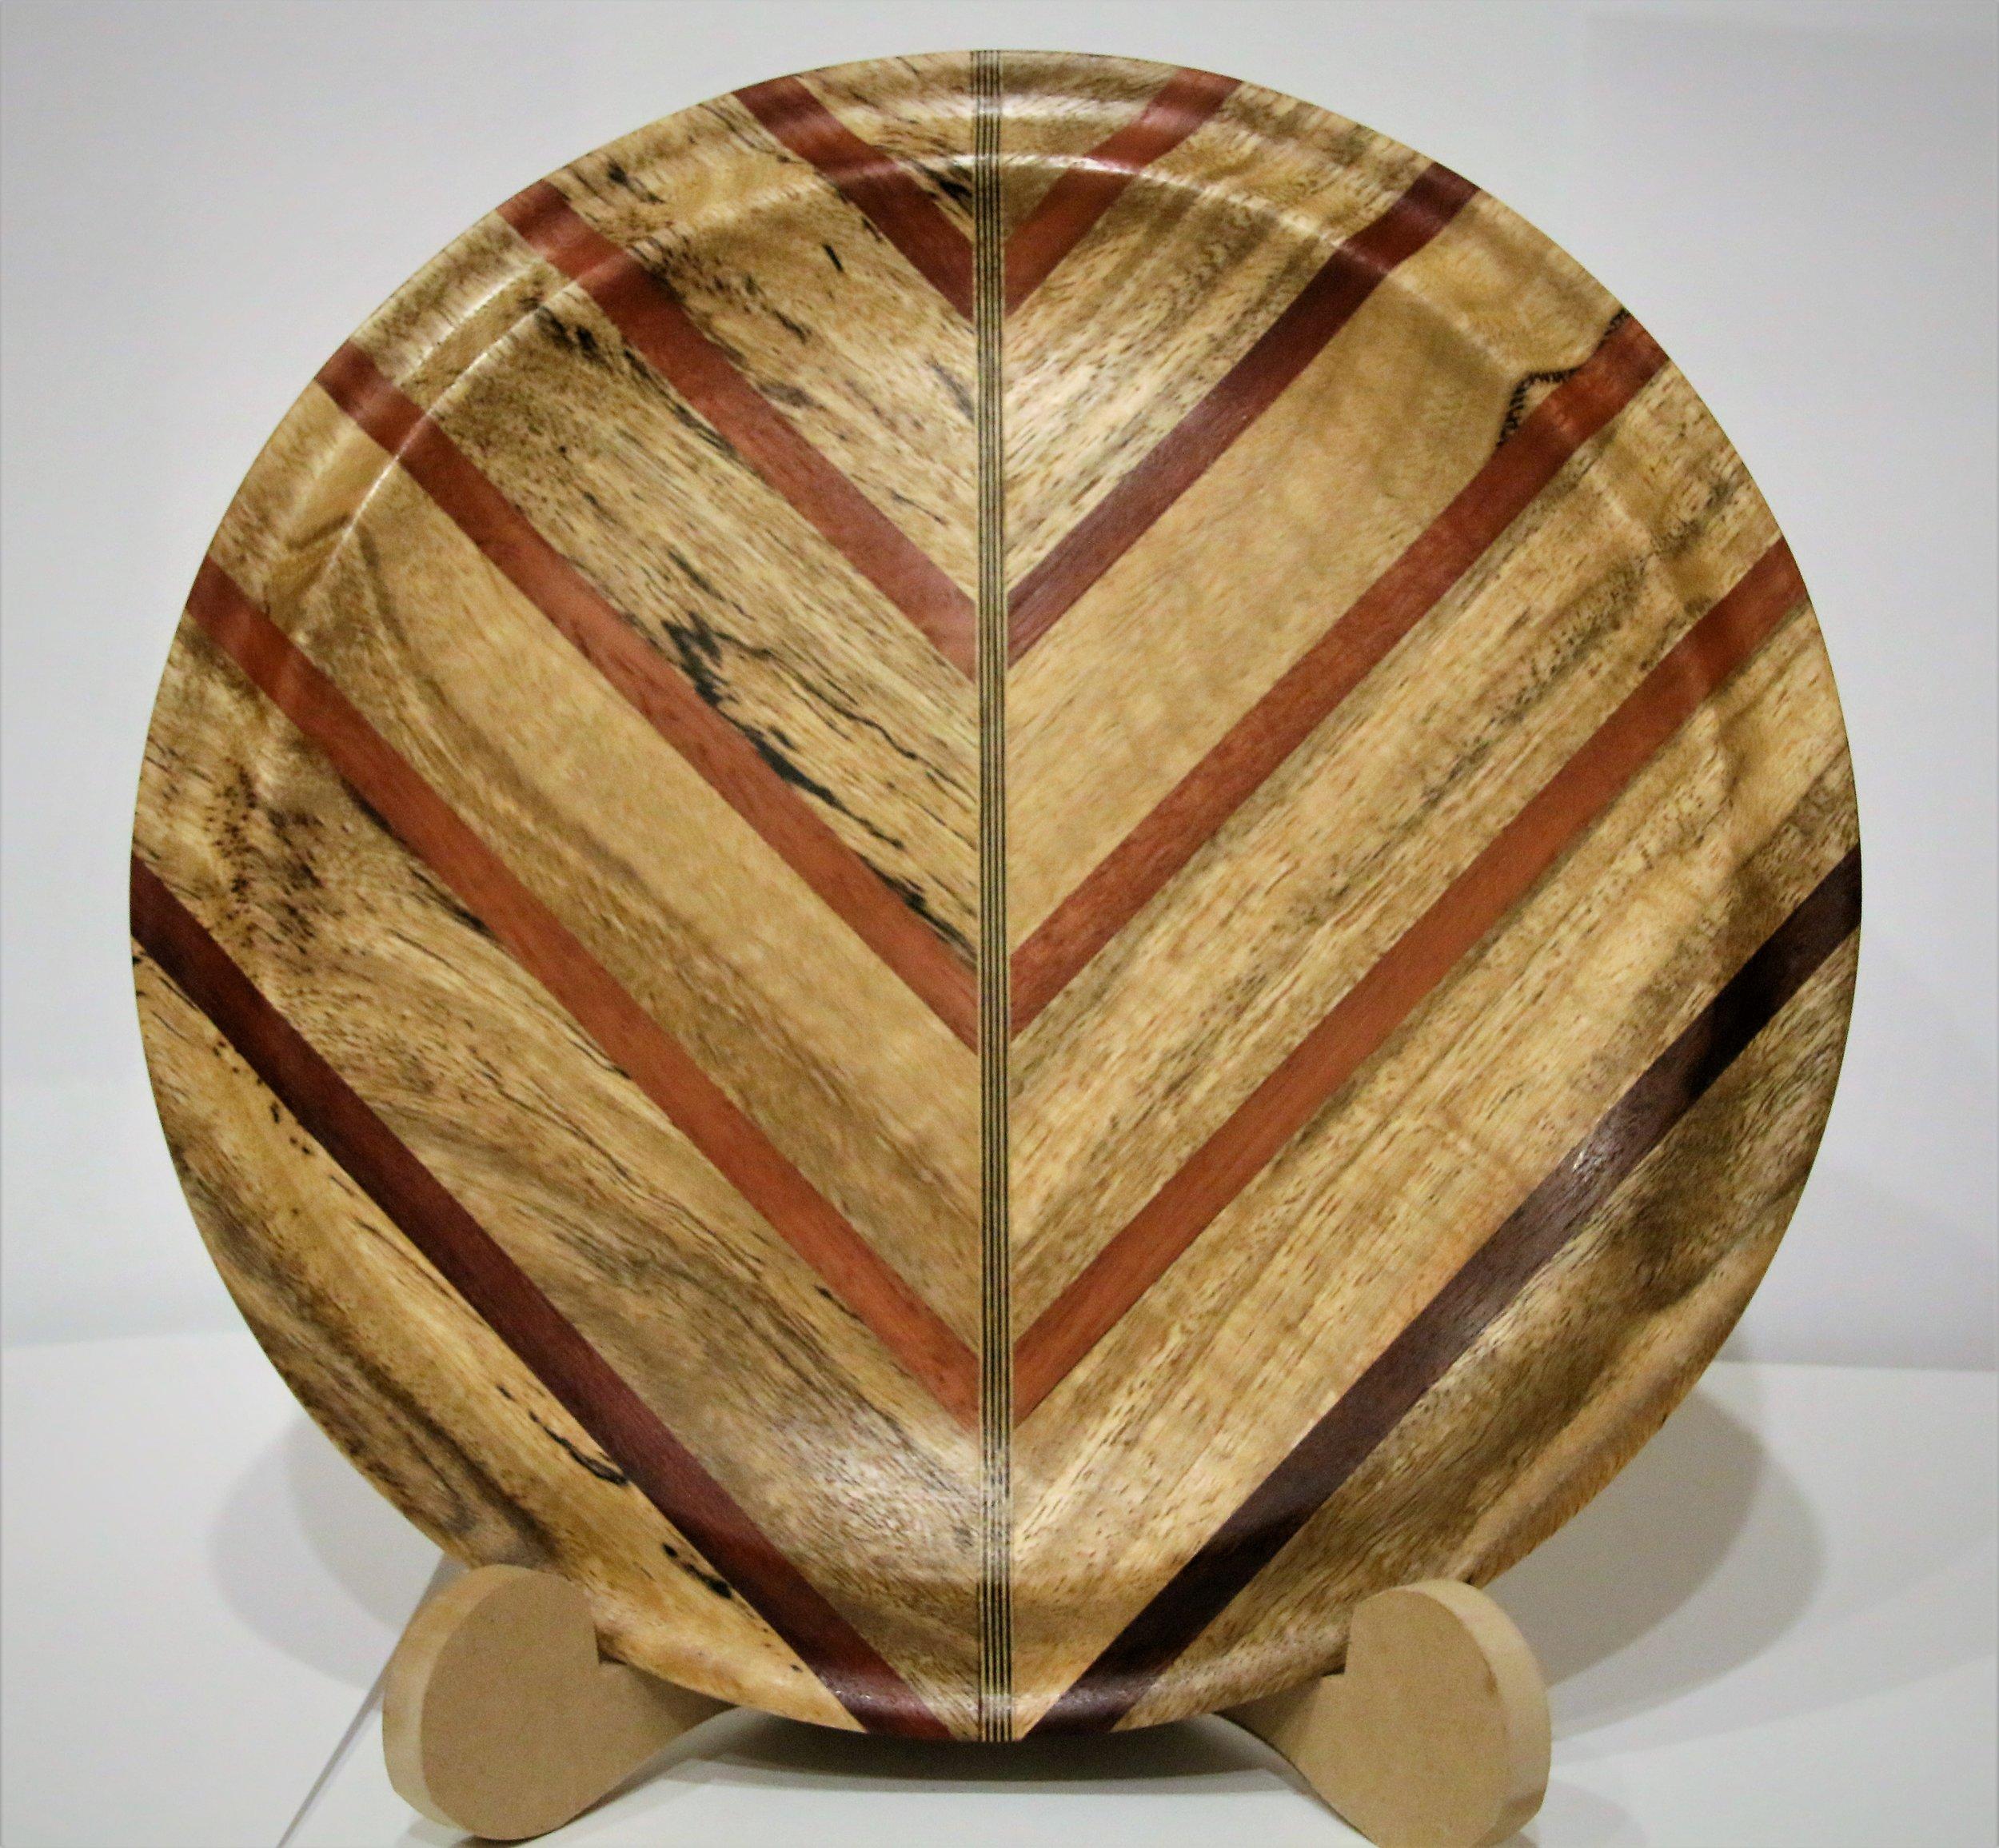 Large Platter - Marri, Jarrah